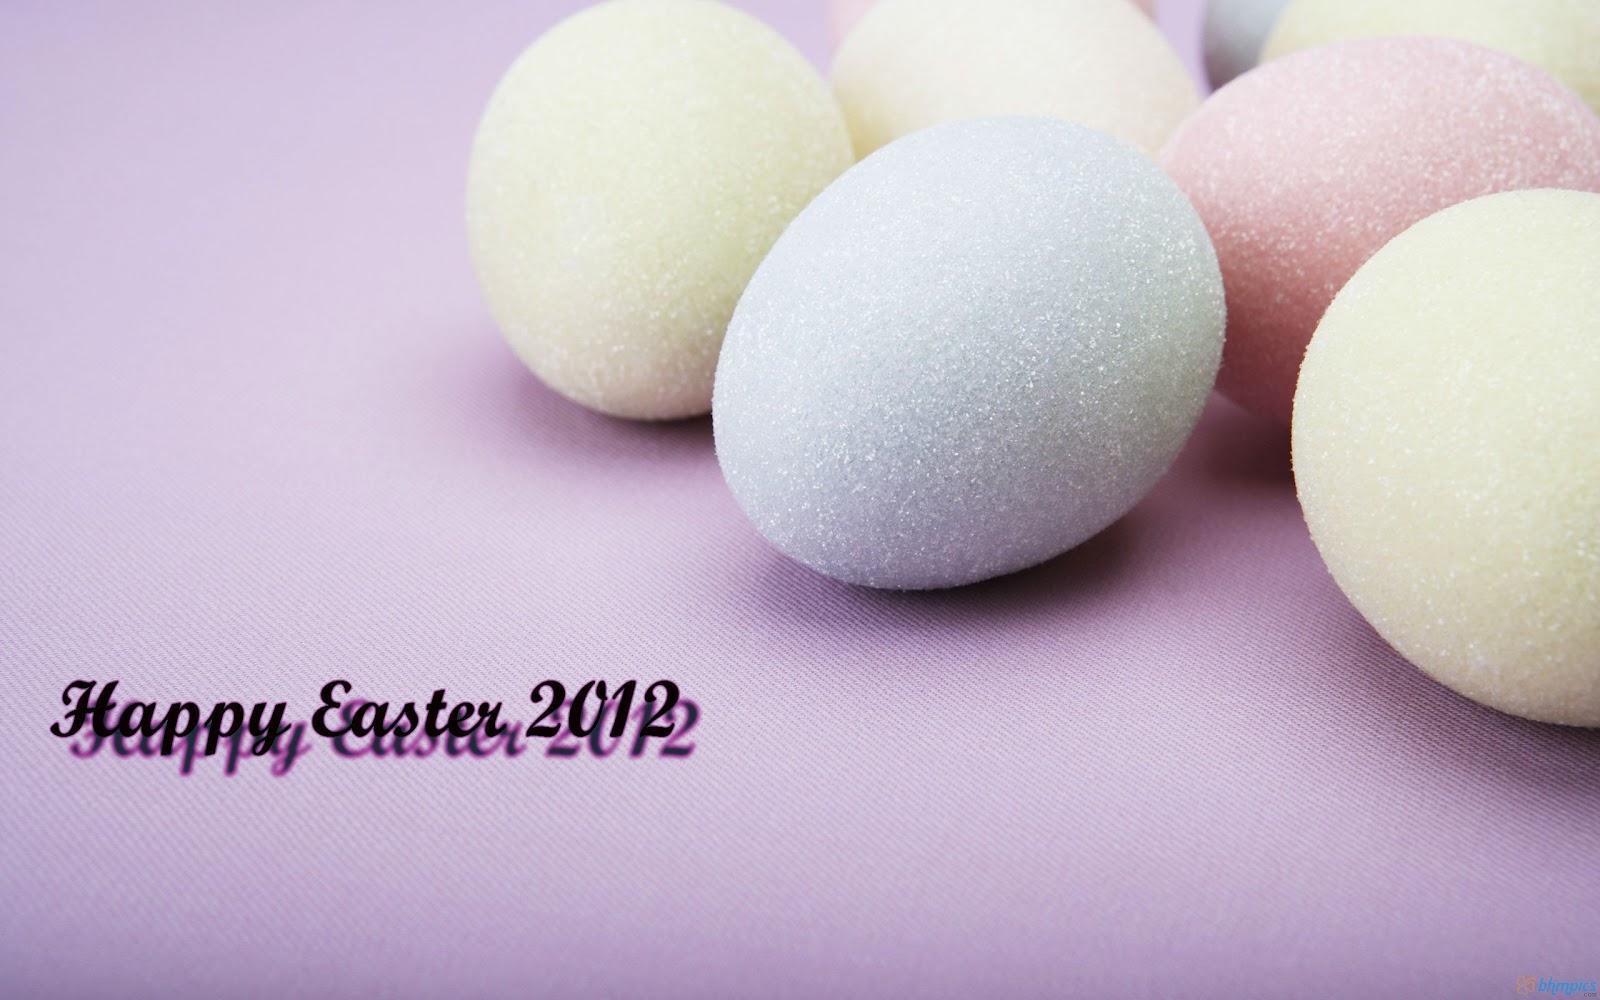 http://4.bp.blogspot.com/-ccKMmQIc4rE/UG0sydqAsnI/AAAAAAAAFQc/0A-eL0oQIHc/s1600/easter_eggs_composition-2560x1600.jpg